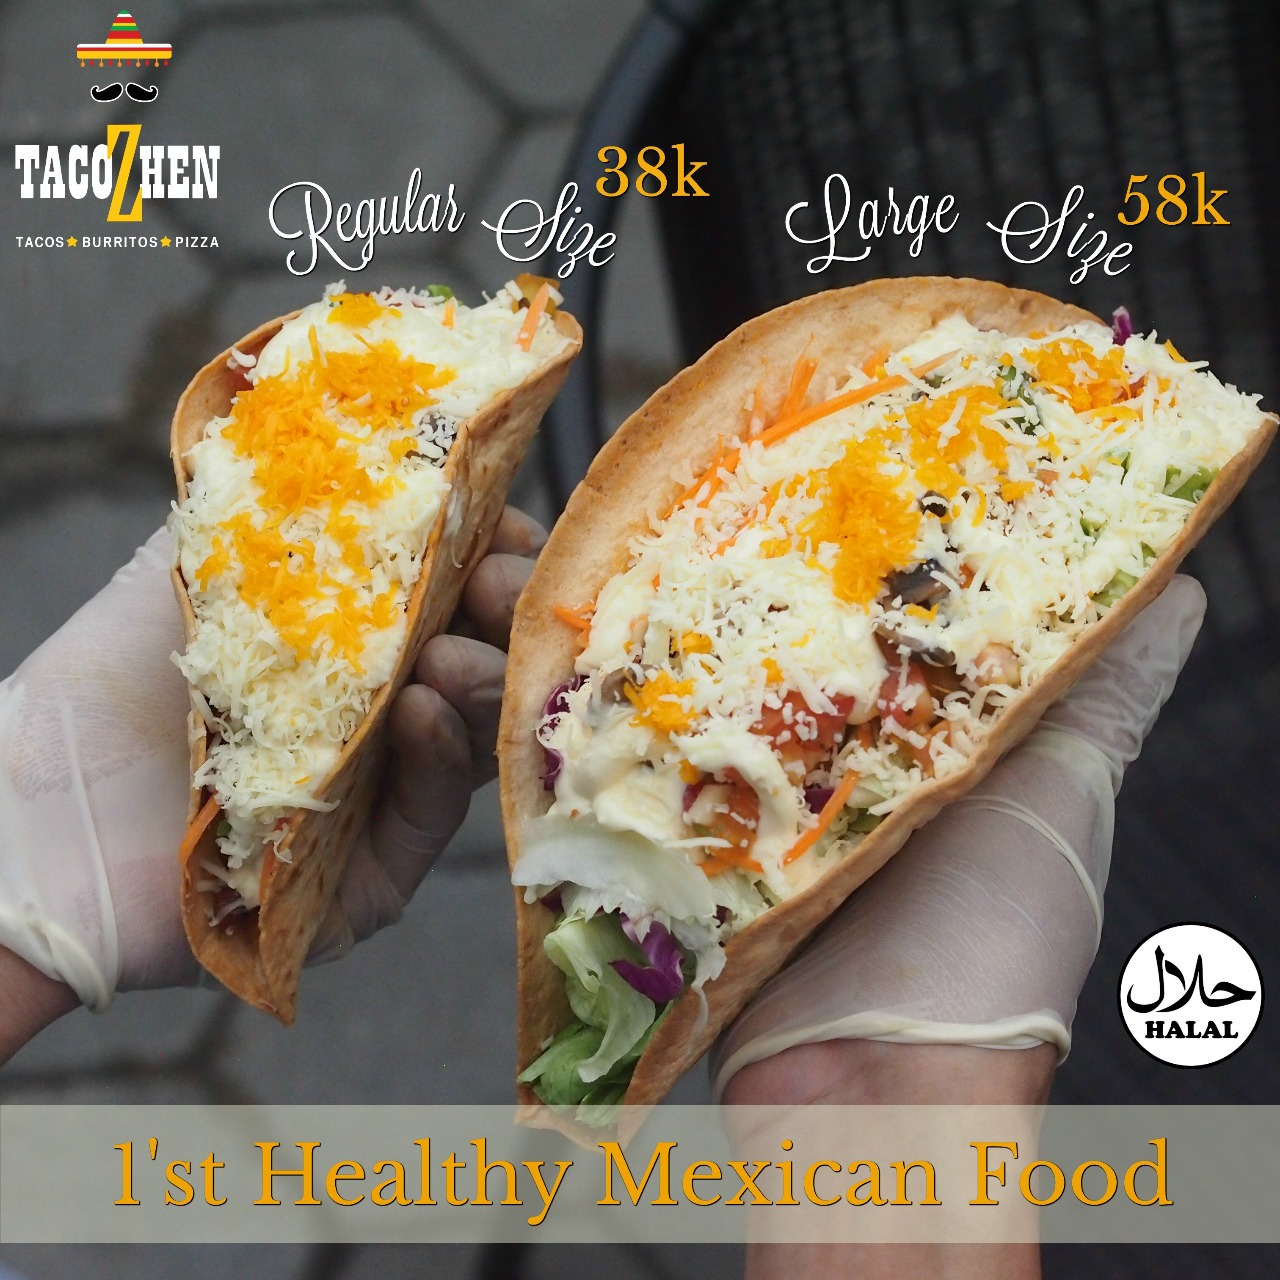 Mengenal Tacozhen, Kuliner Sehat ala Meksiko